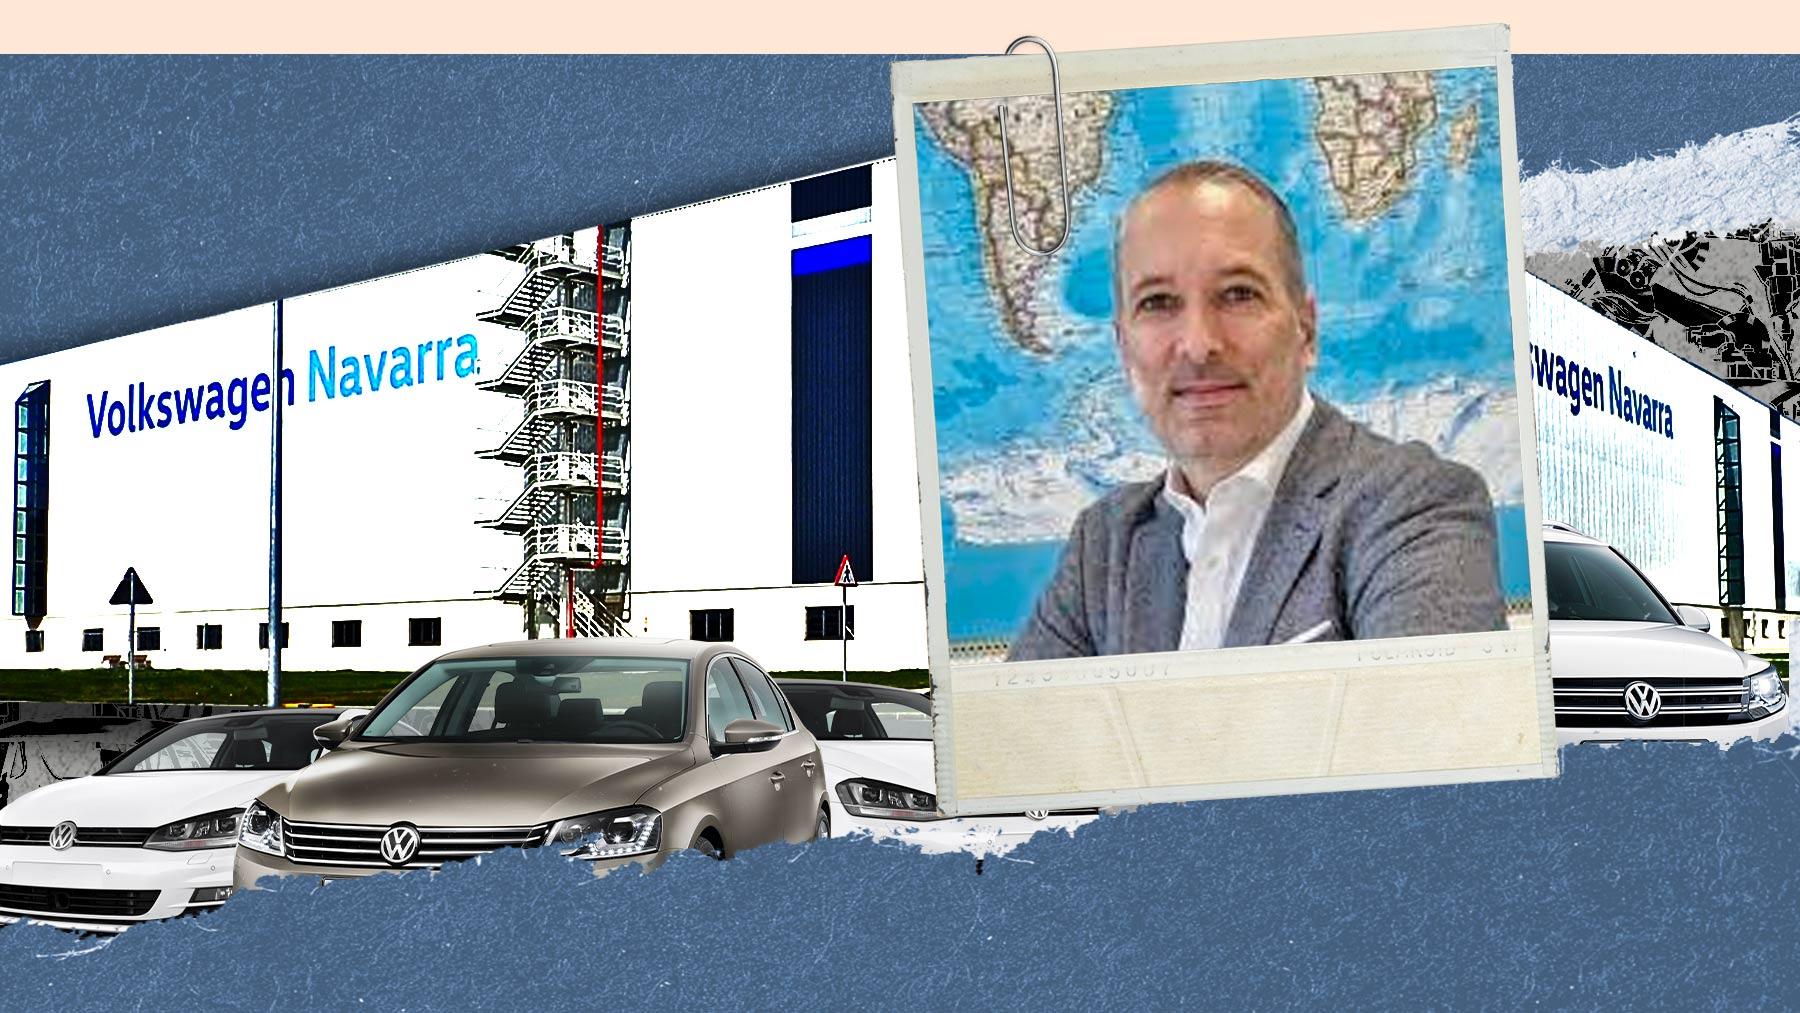 Markus Haupt, próximo presidente de Volkswagen Navarra